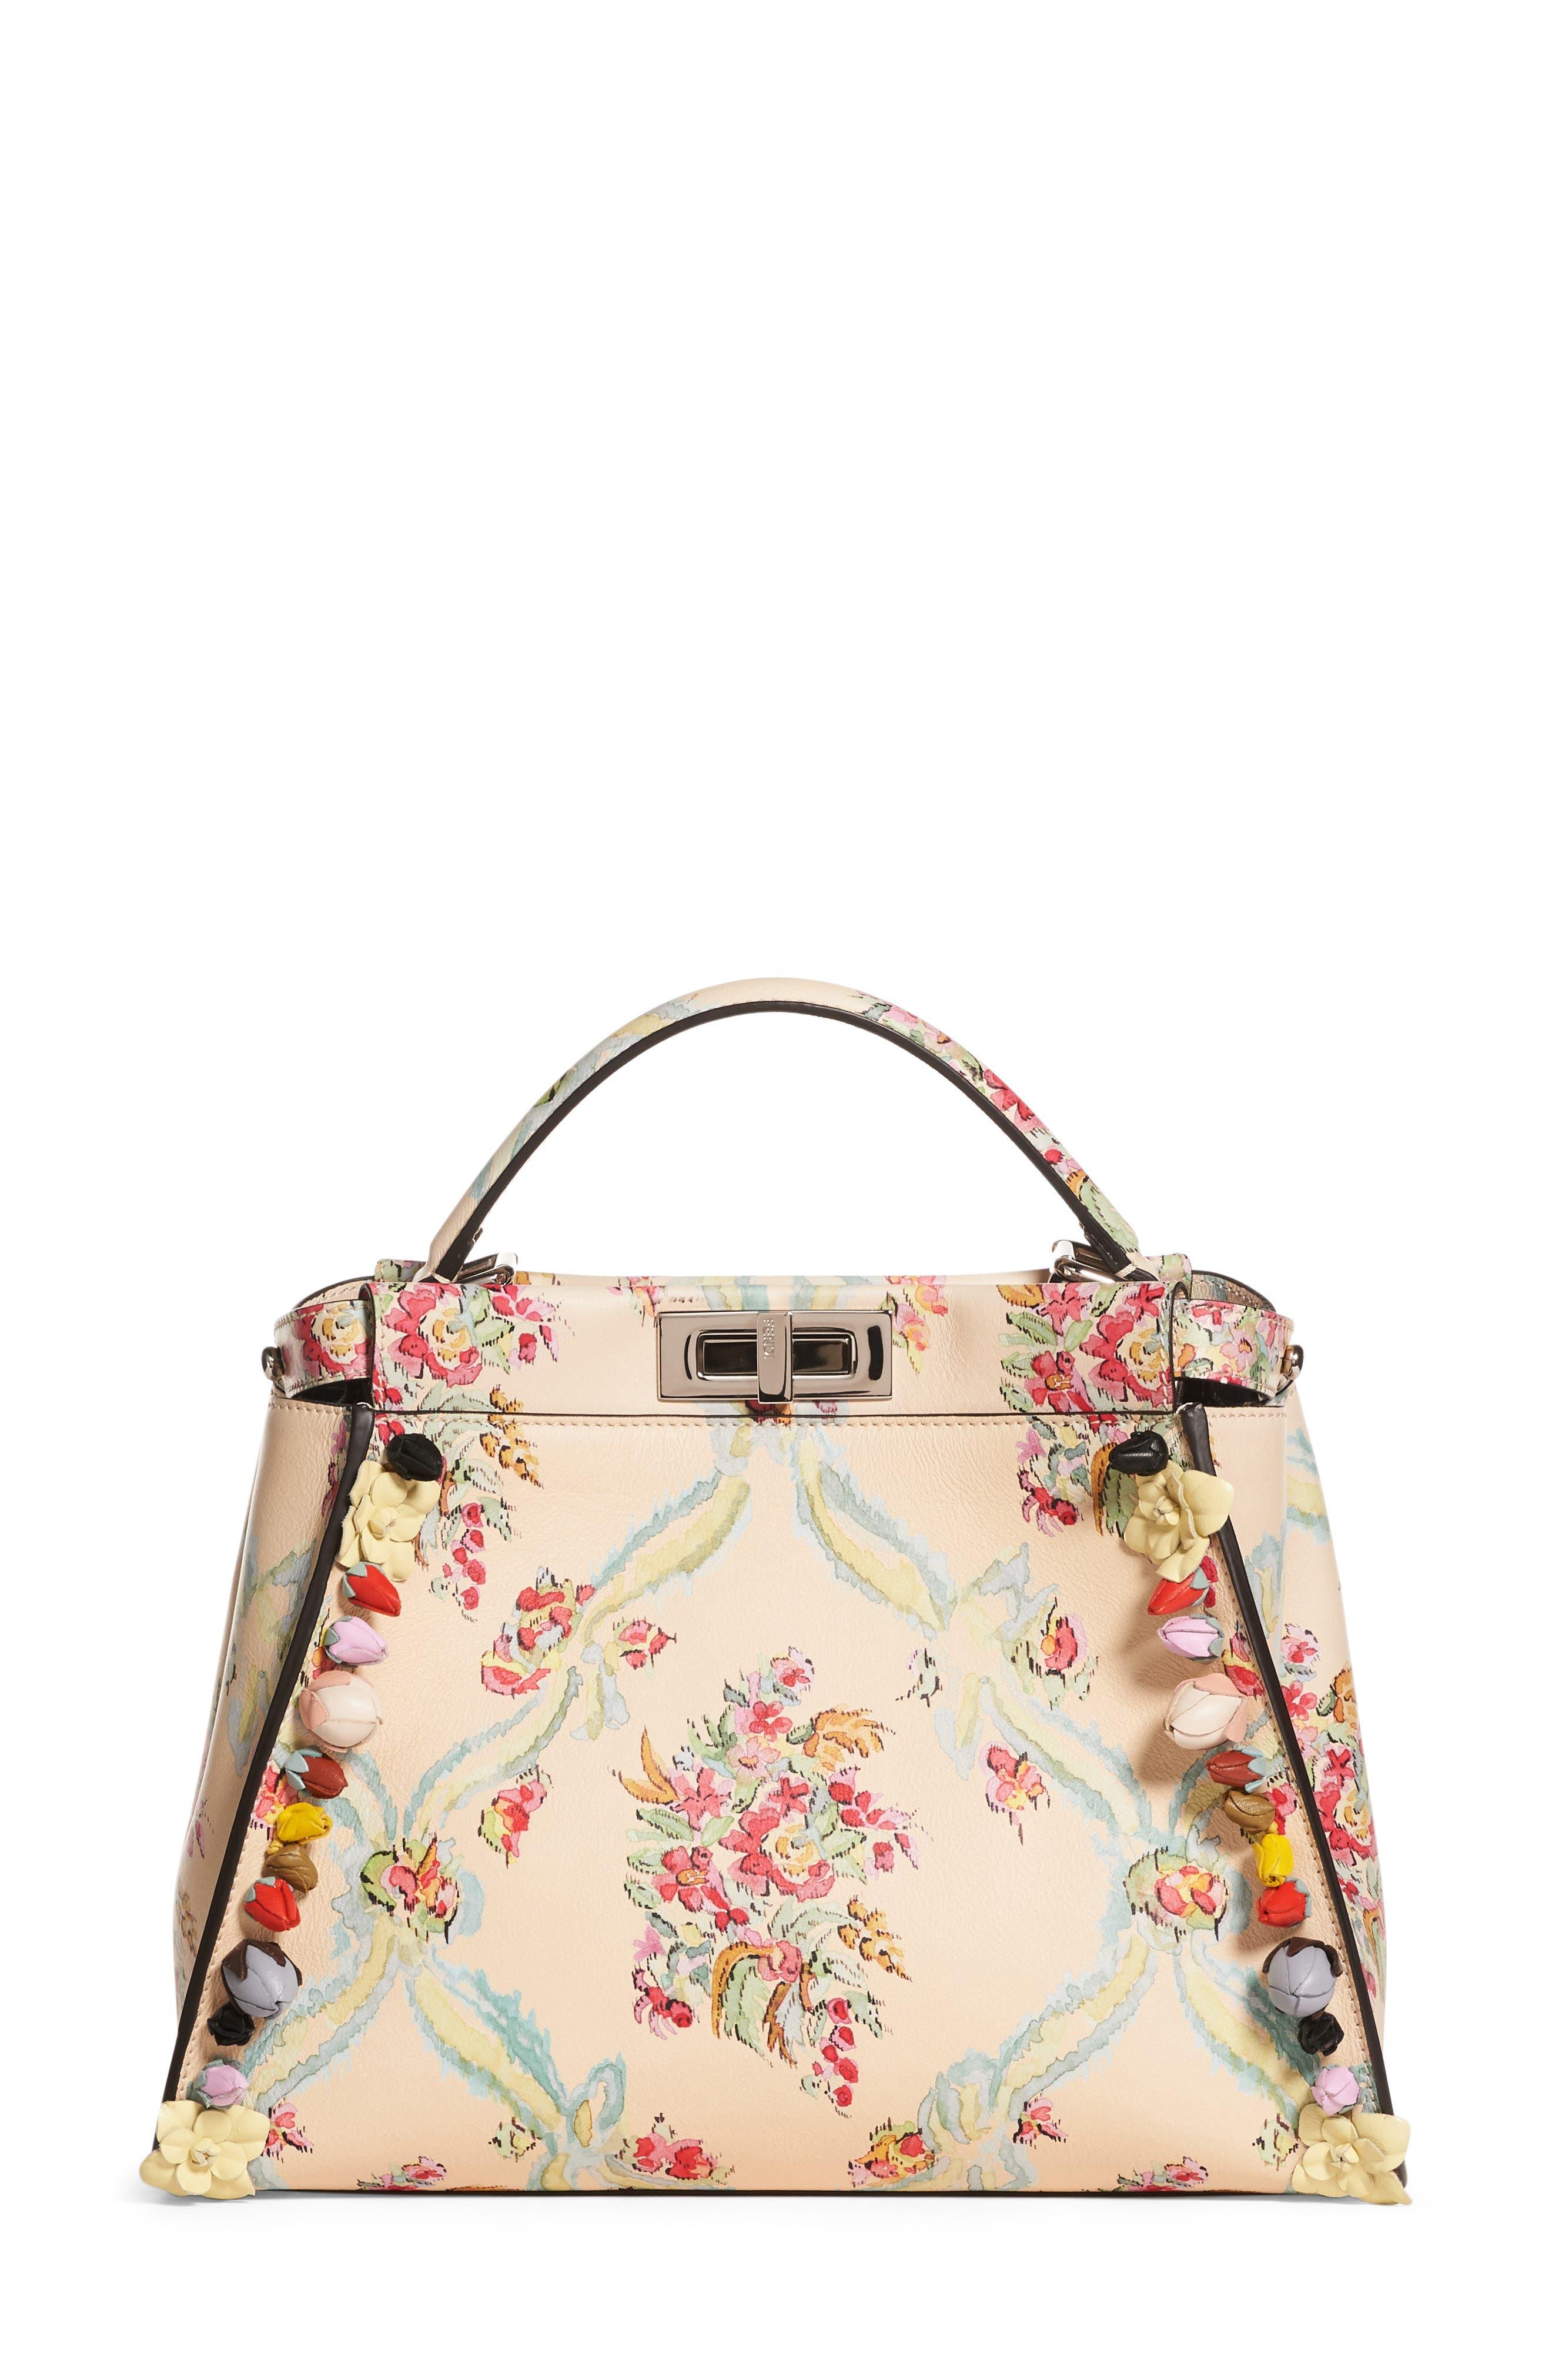 Alternate Image 1 Selected - Fendi Medium Peekaboo Floral Appliqué Leather Satchel